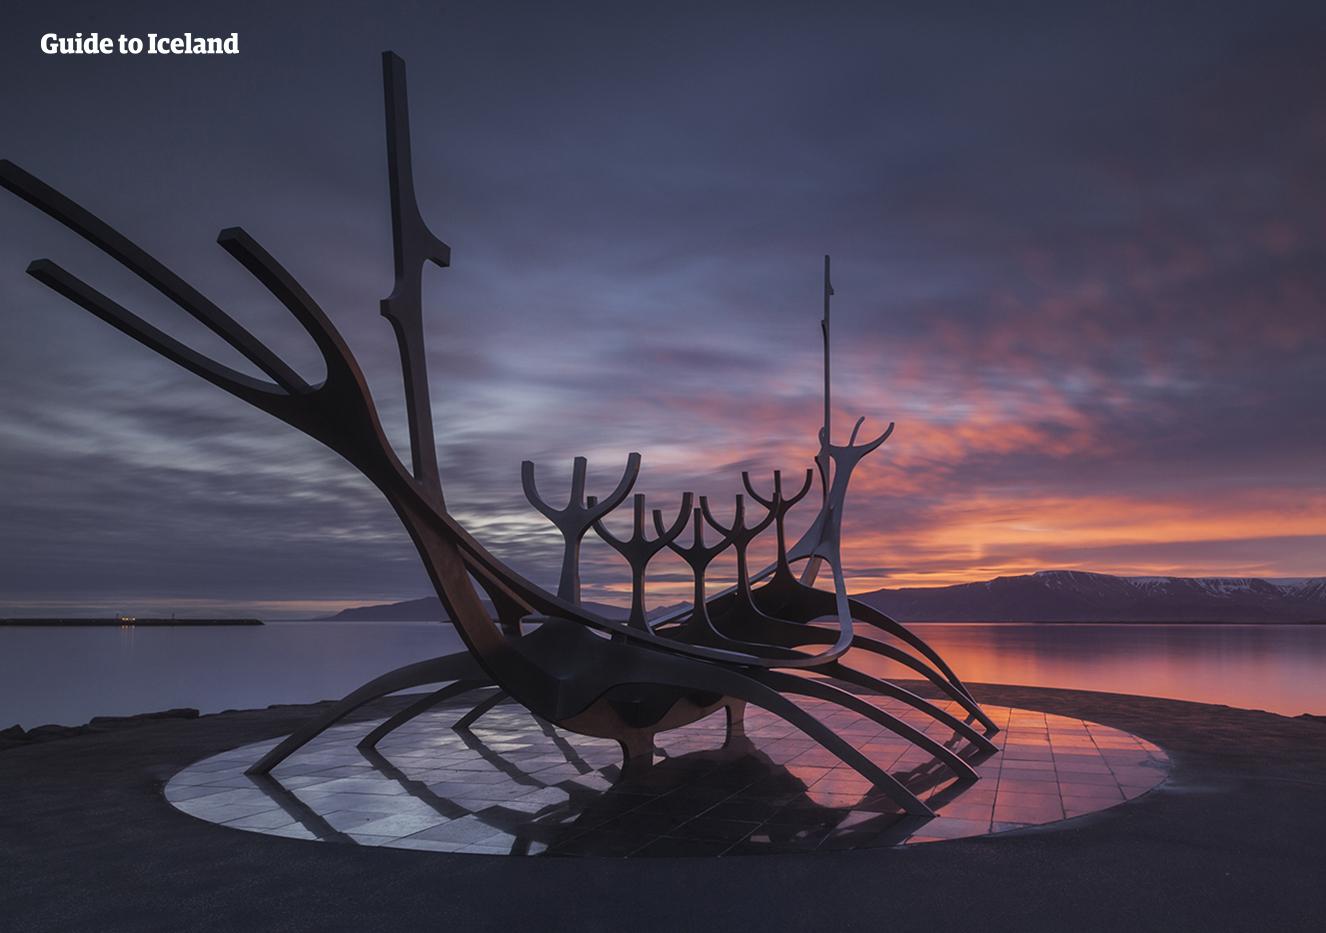 6 Day Midnight Sun Summer Self Drive Tour of Iceland's Hidden Gems & Black Sand Beaches - day 6